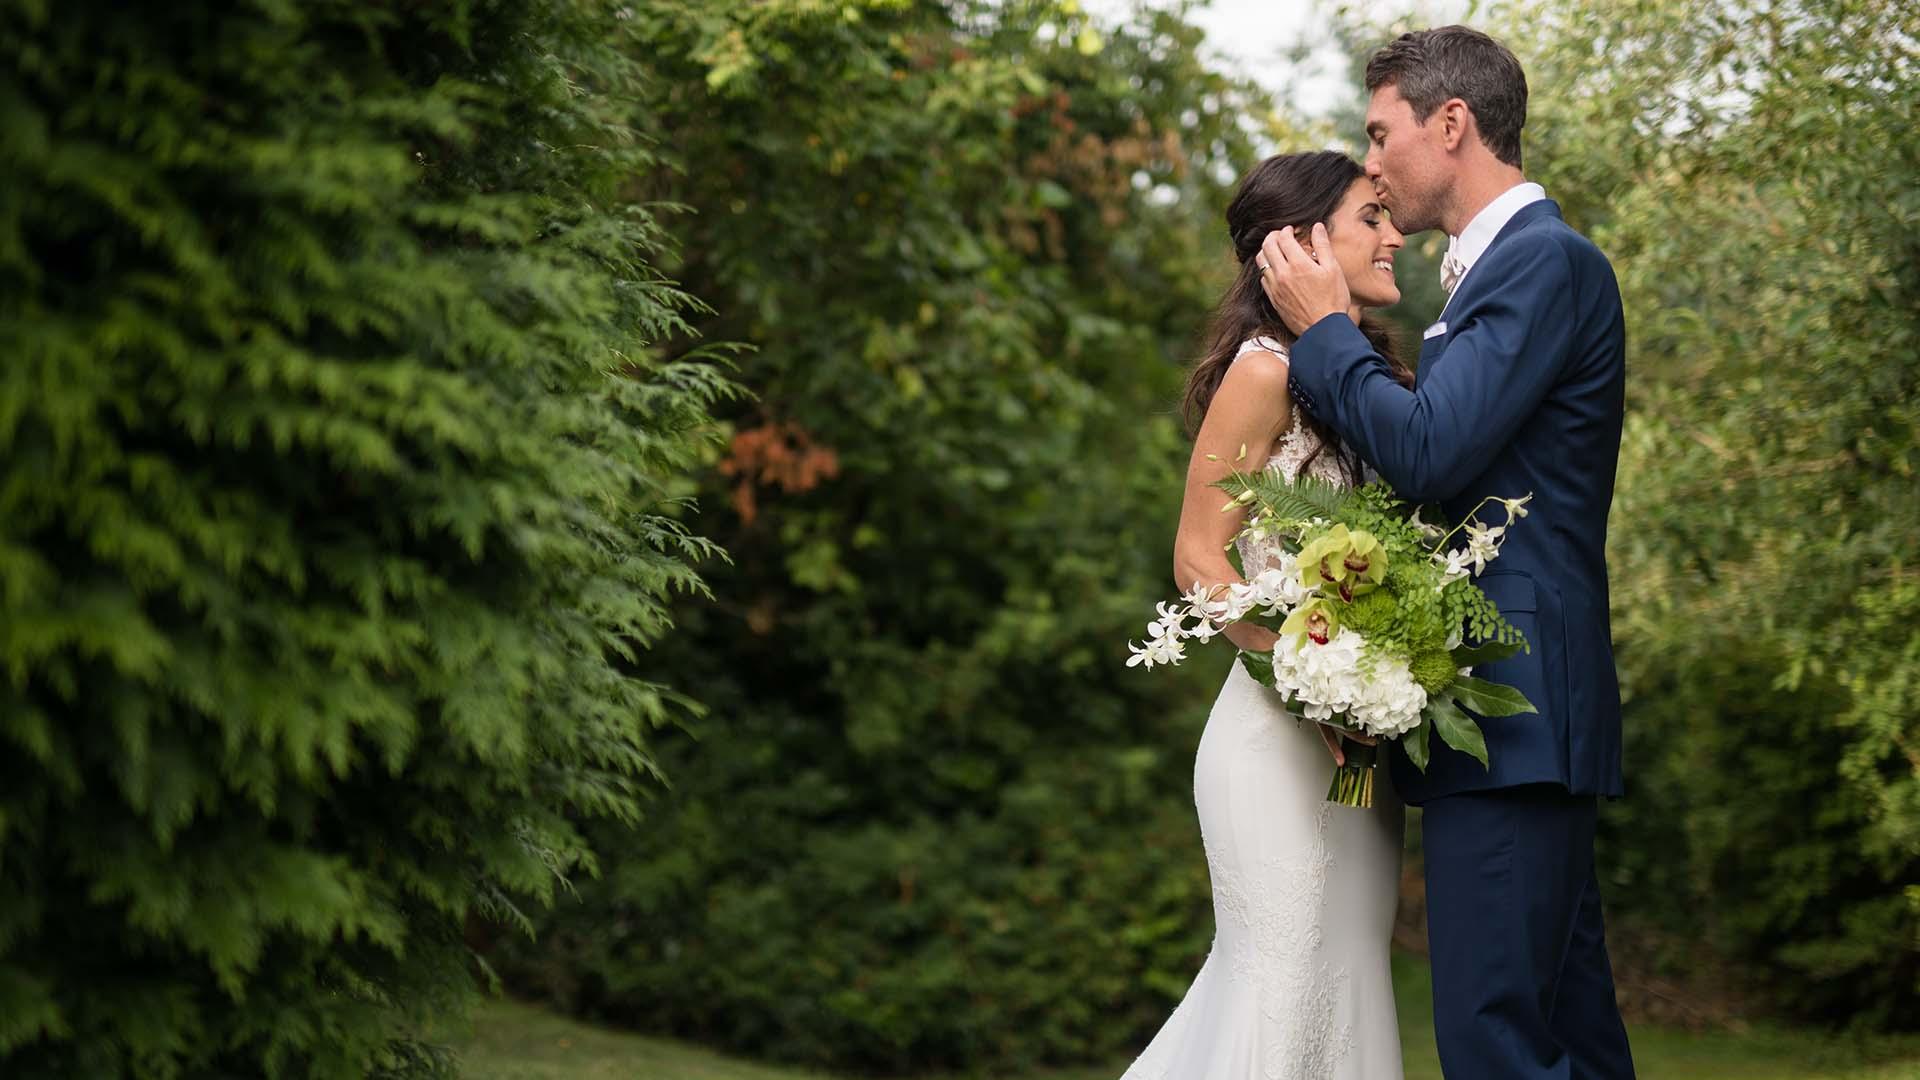 willows lodge wedding seattle wedding photographers woodinville washington salt and pine